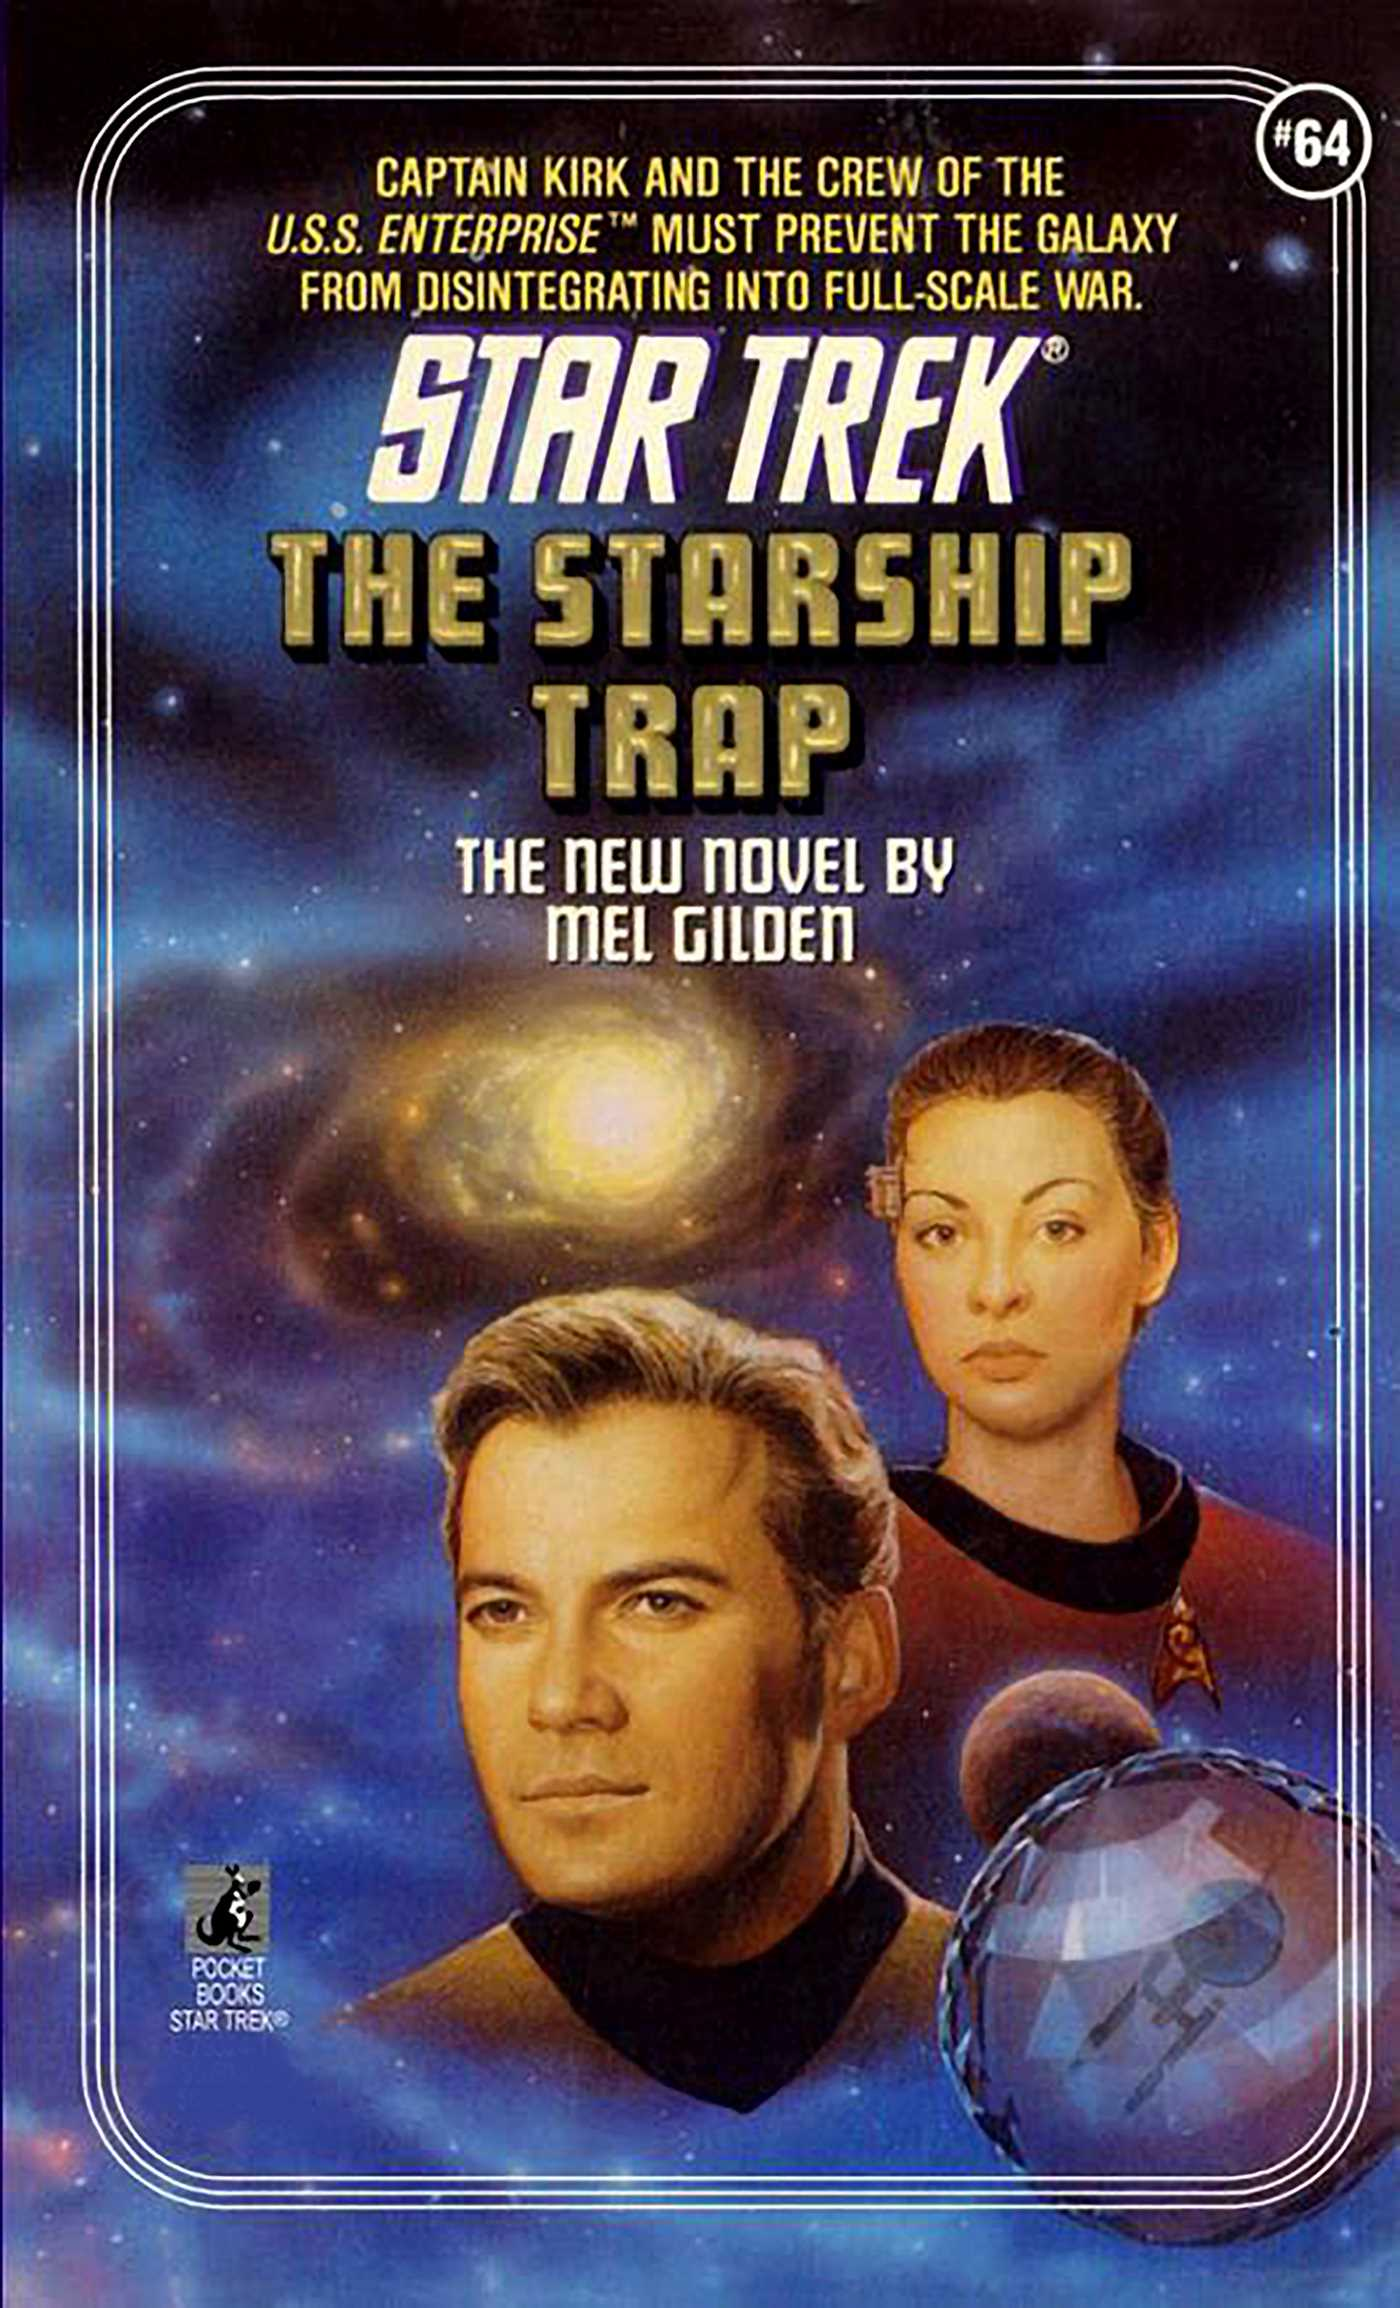 The starship trap 9780743420150 hr